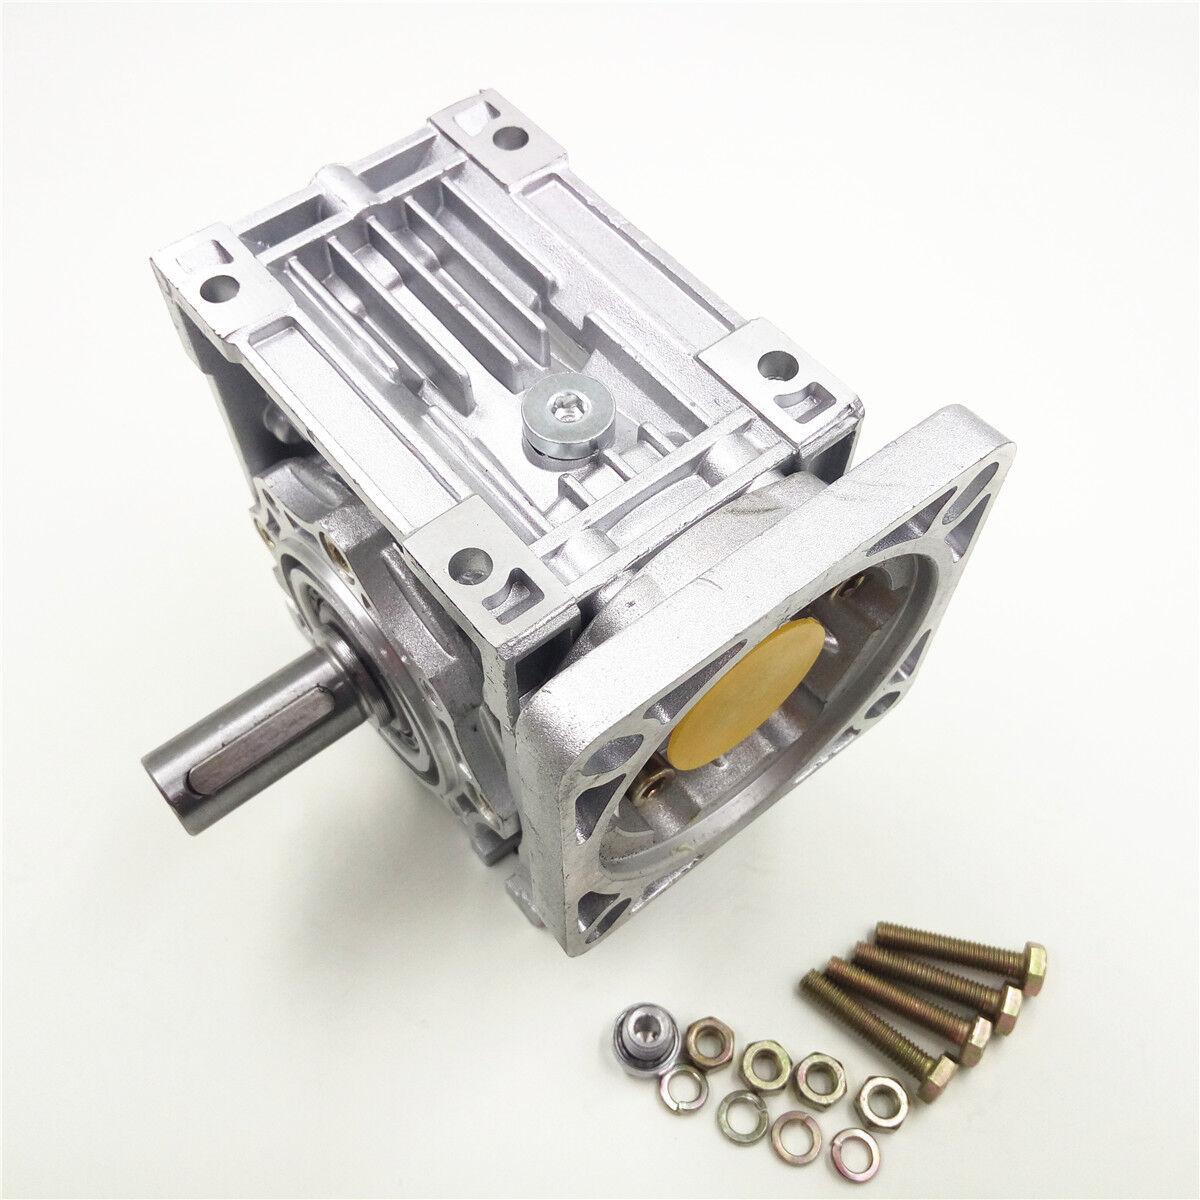 Nema34 Worm Gearbox Geared Speed Reducer 14mm Input Reduction for Stepper Motor 10